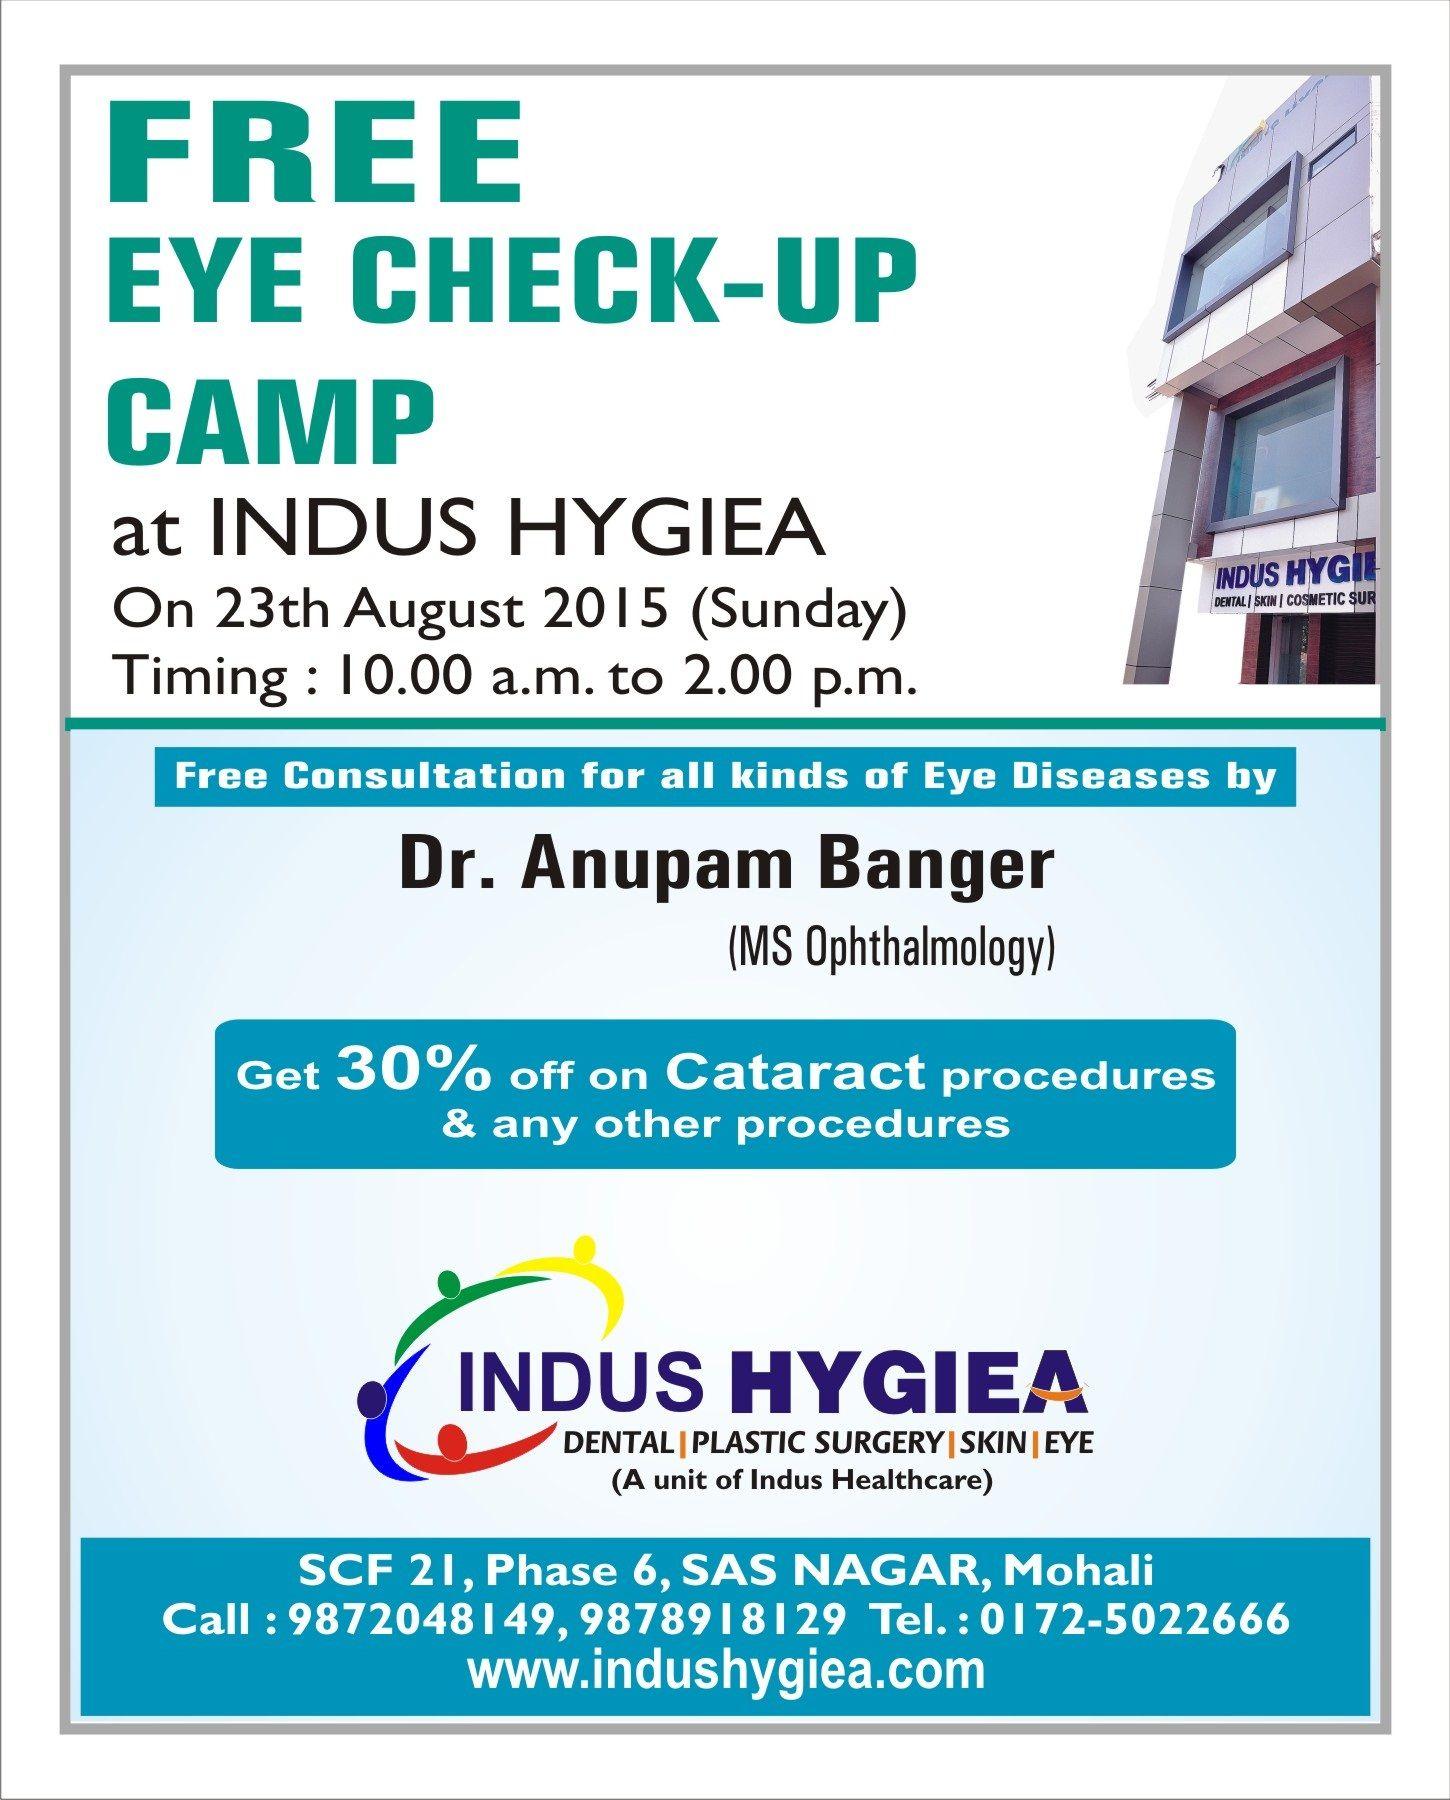 7b2bd133e55 Indus Hygiea organizes Free Eye Check-up Camp tomorrow at 10 am to 2 ...